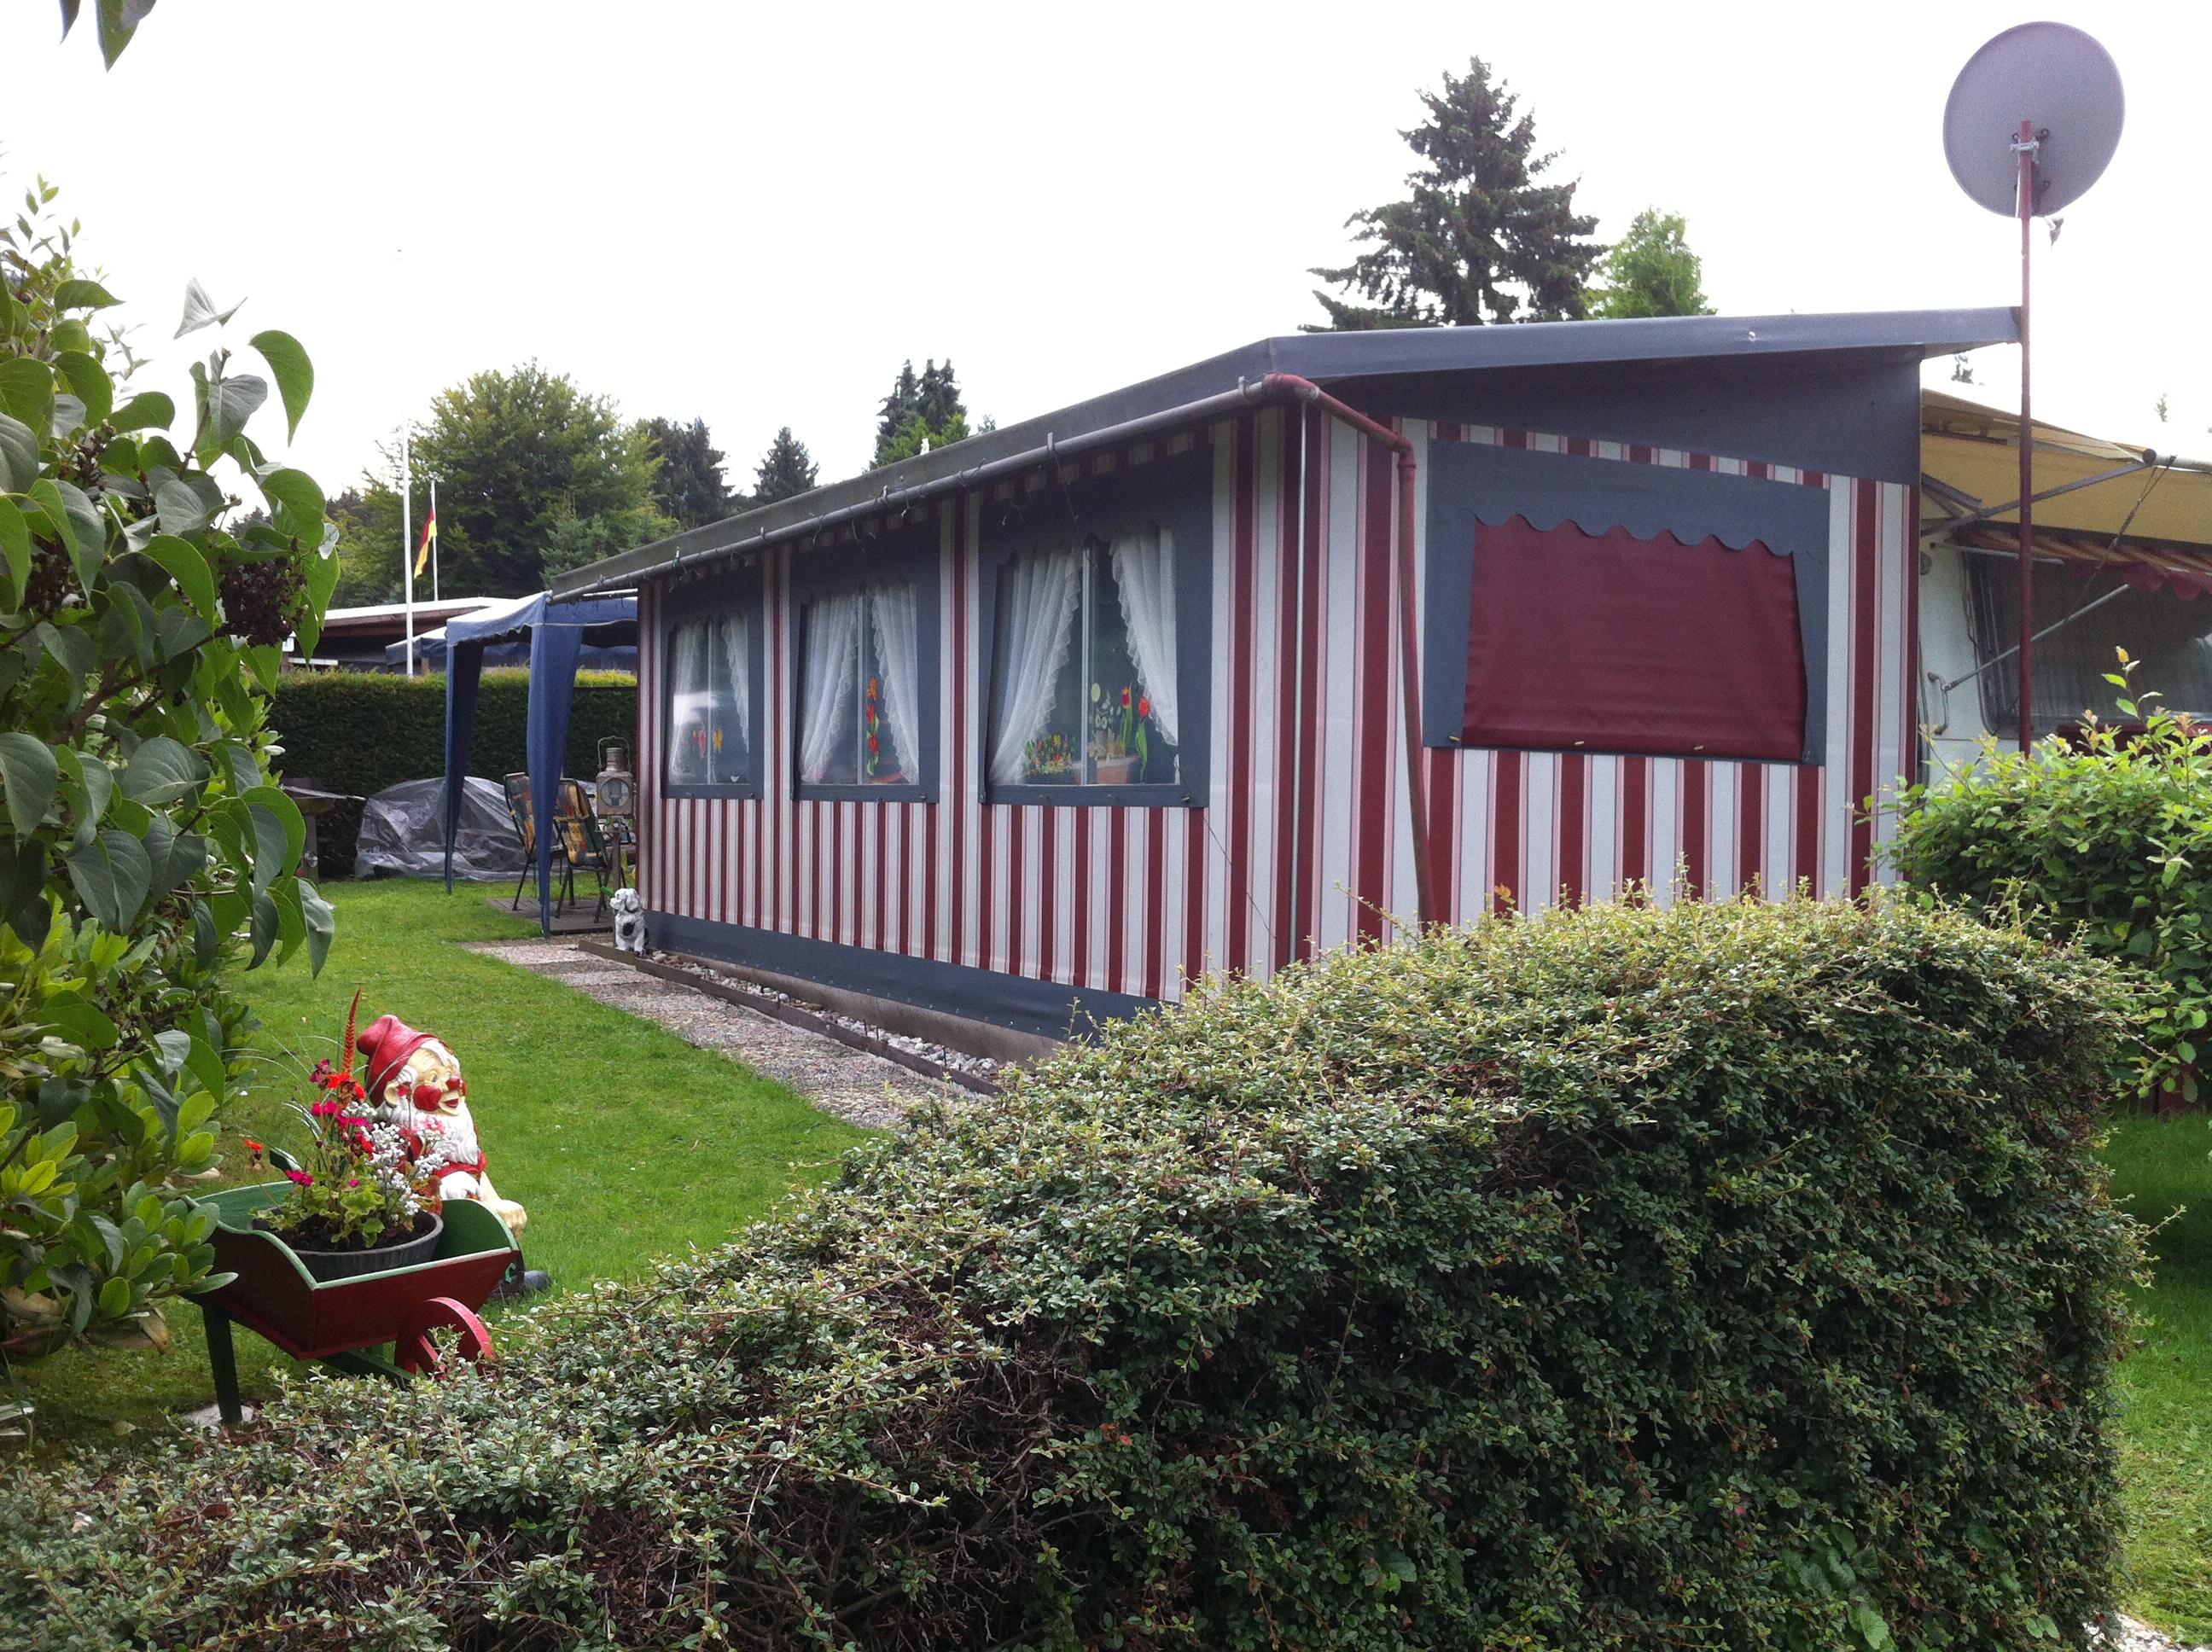 127 urlaub auf dem campingplatz. Black Bedroom Furniture Sets. Home Design Ideas